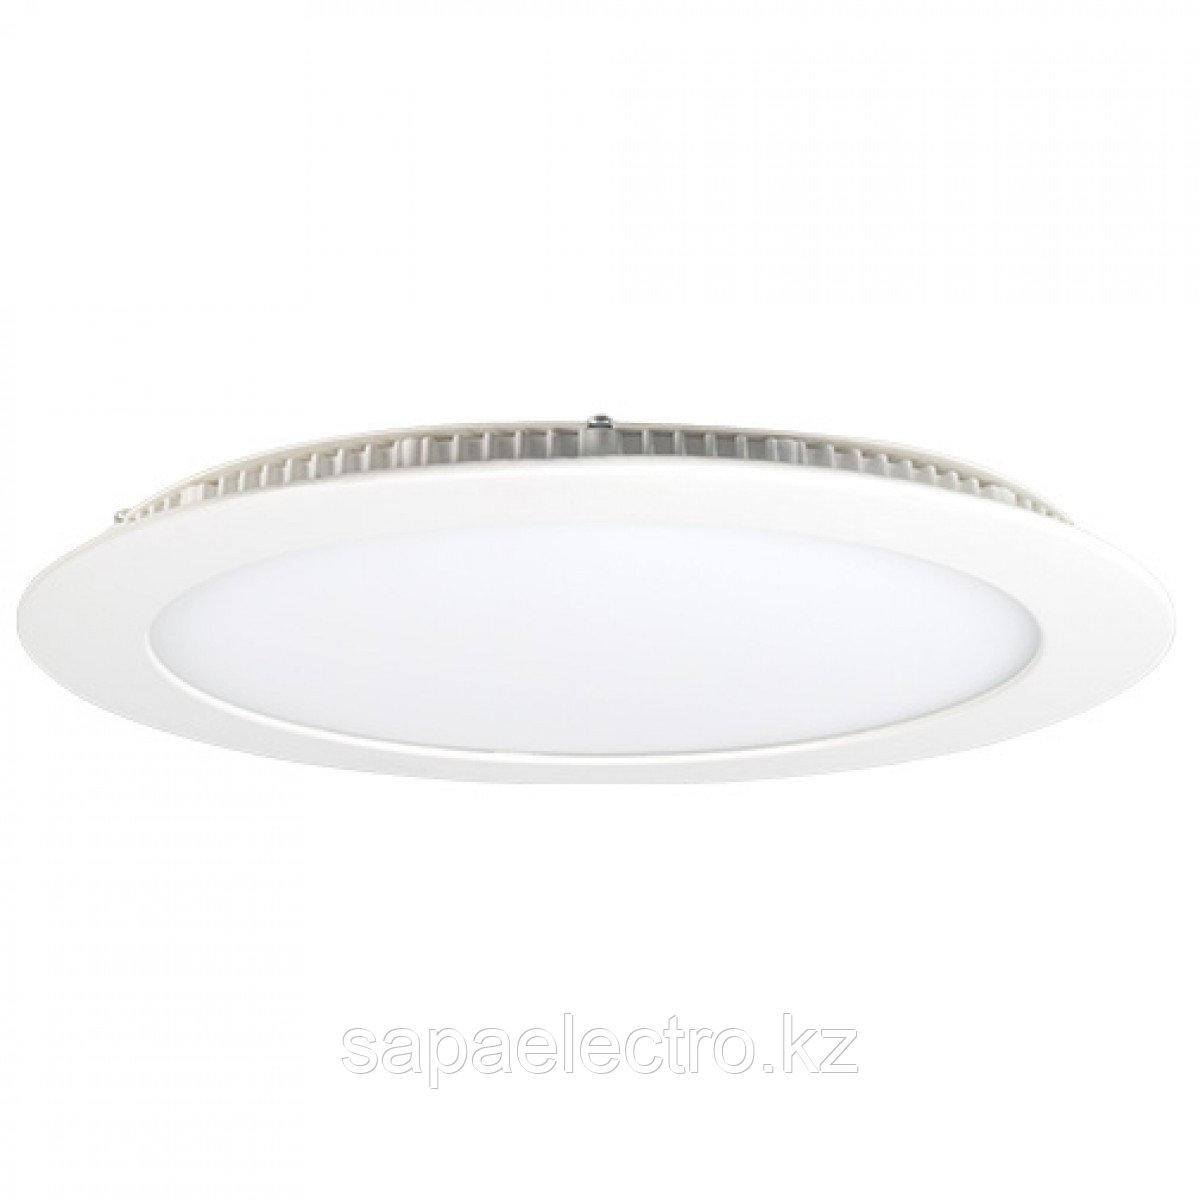 Свет-к DL LED ROUND PANEL 24W 3000K (TS) 20шт